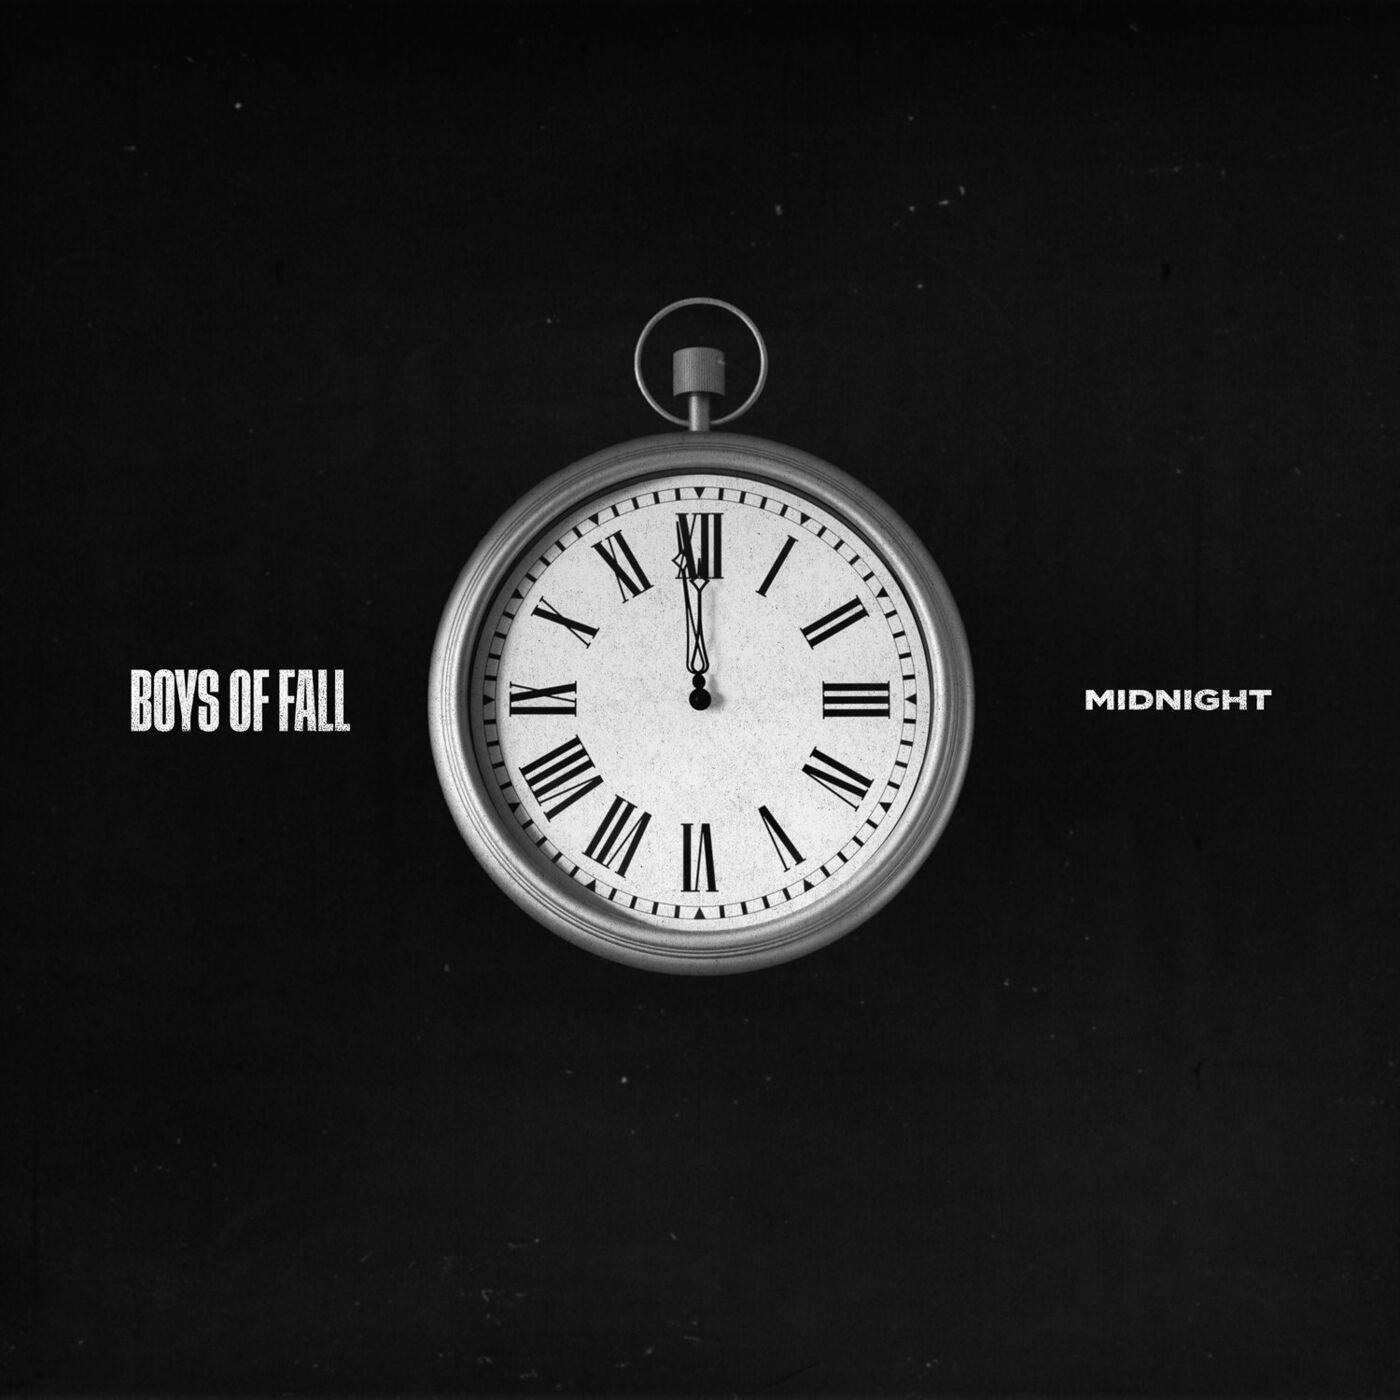 Boys of Fall - Midnight [single] (2020)